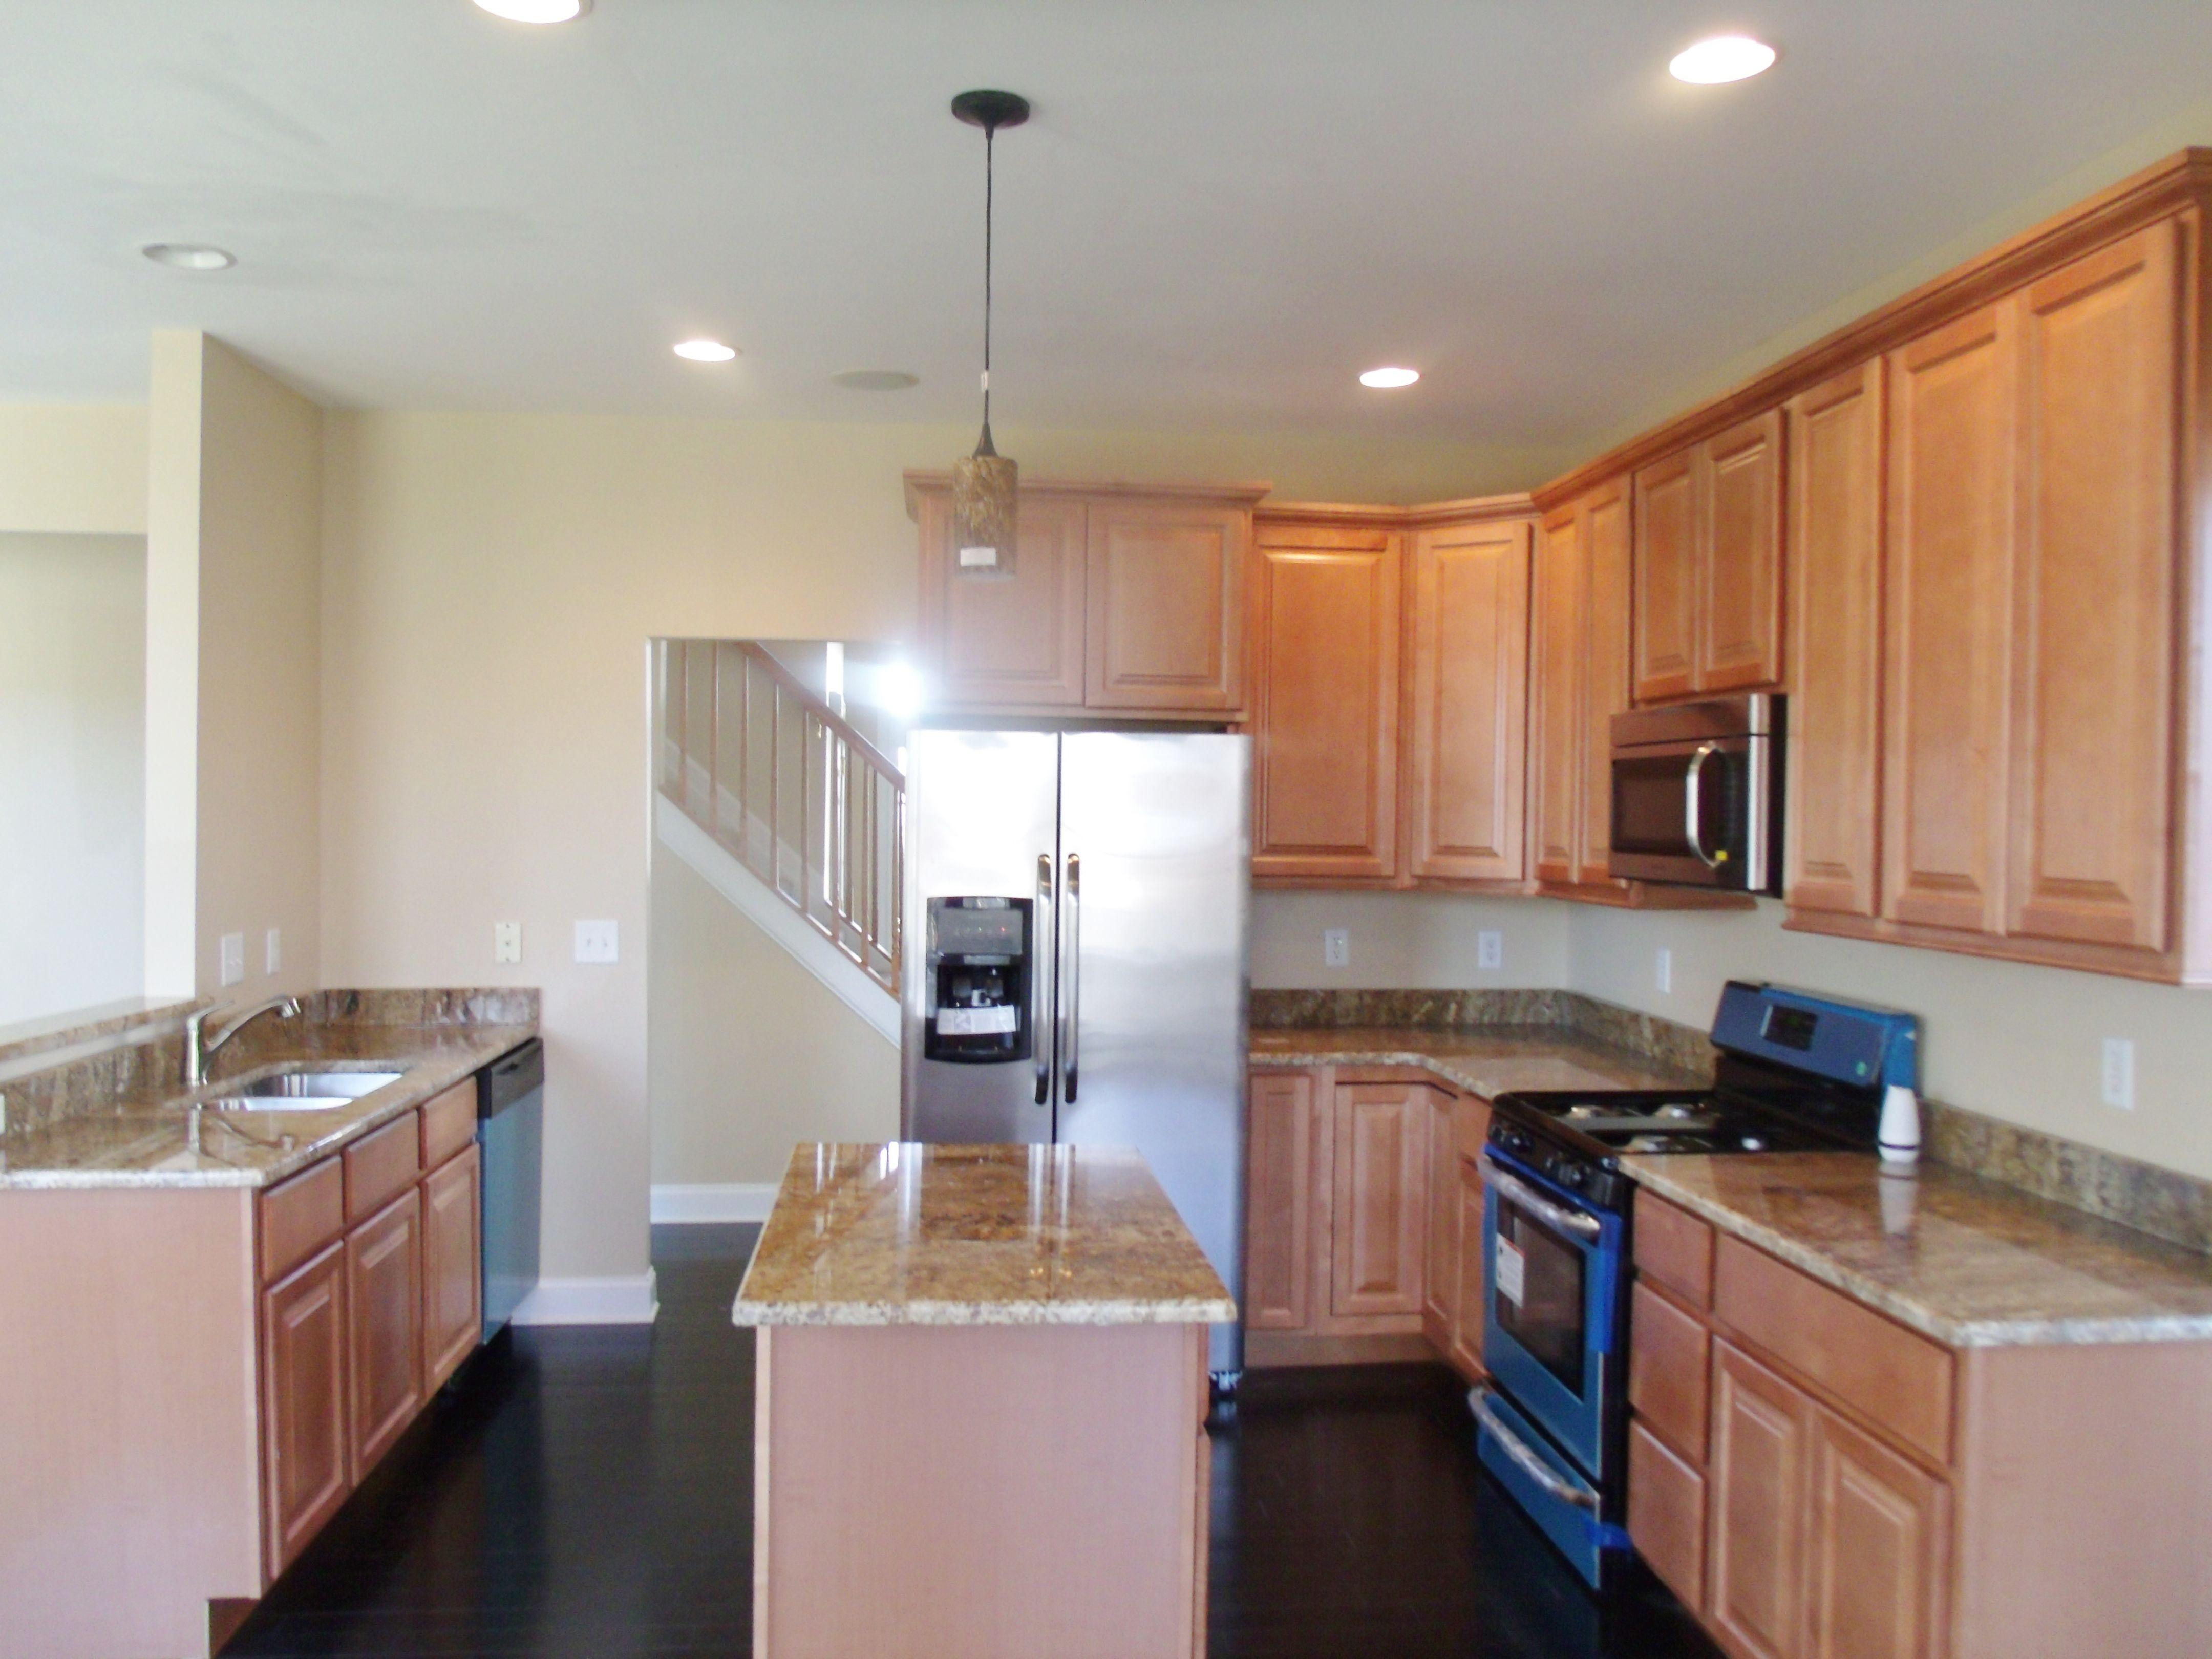 Home For Sale In Smyrna Delaware Home Kitchen Cabinets Kitchen